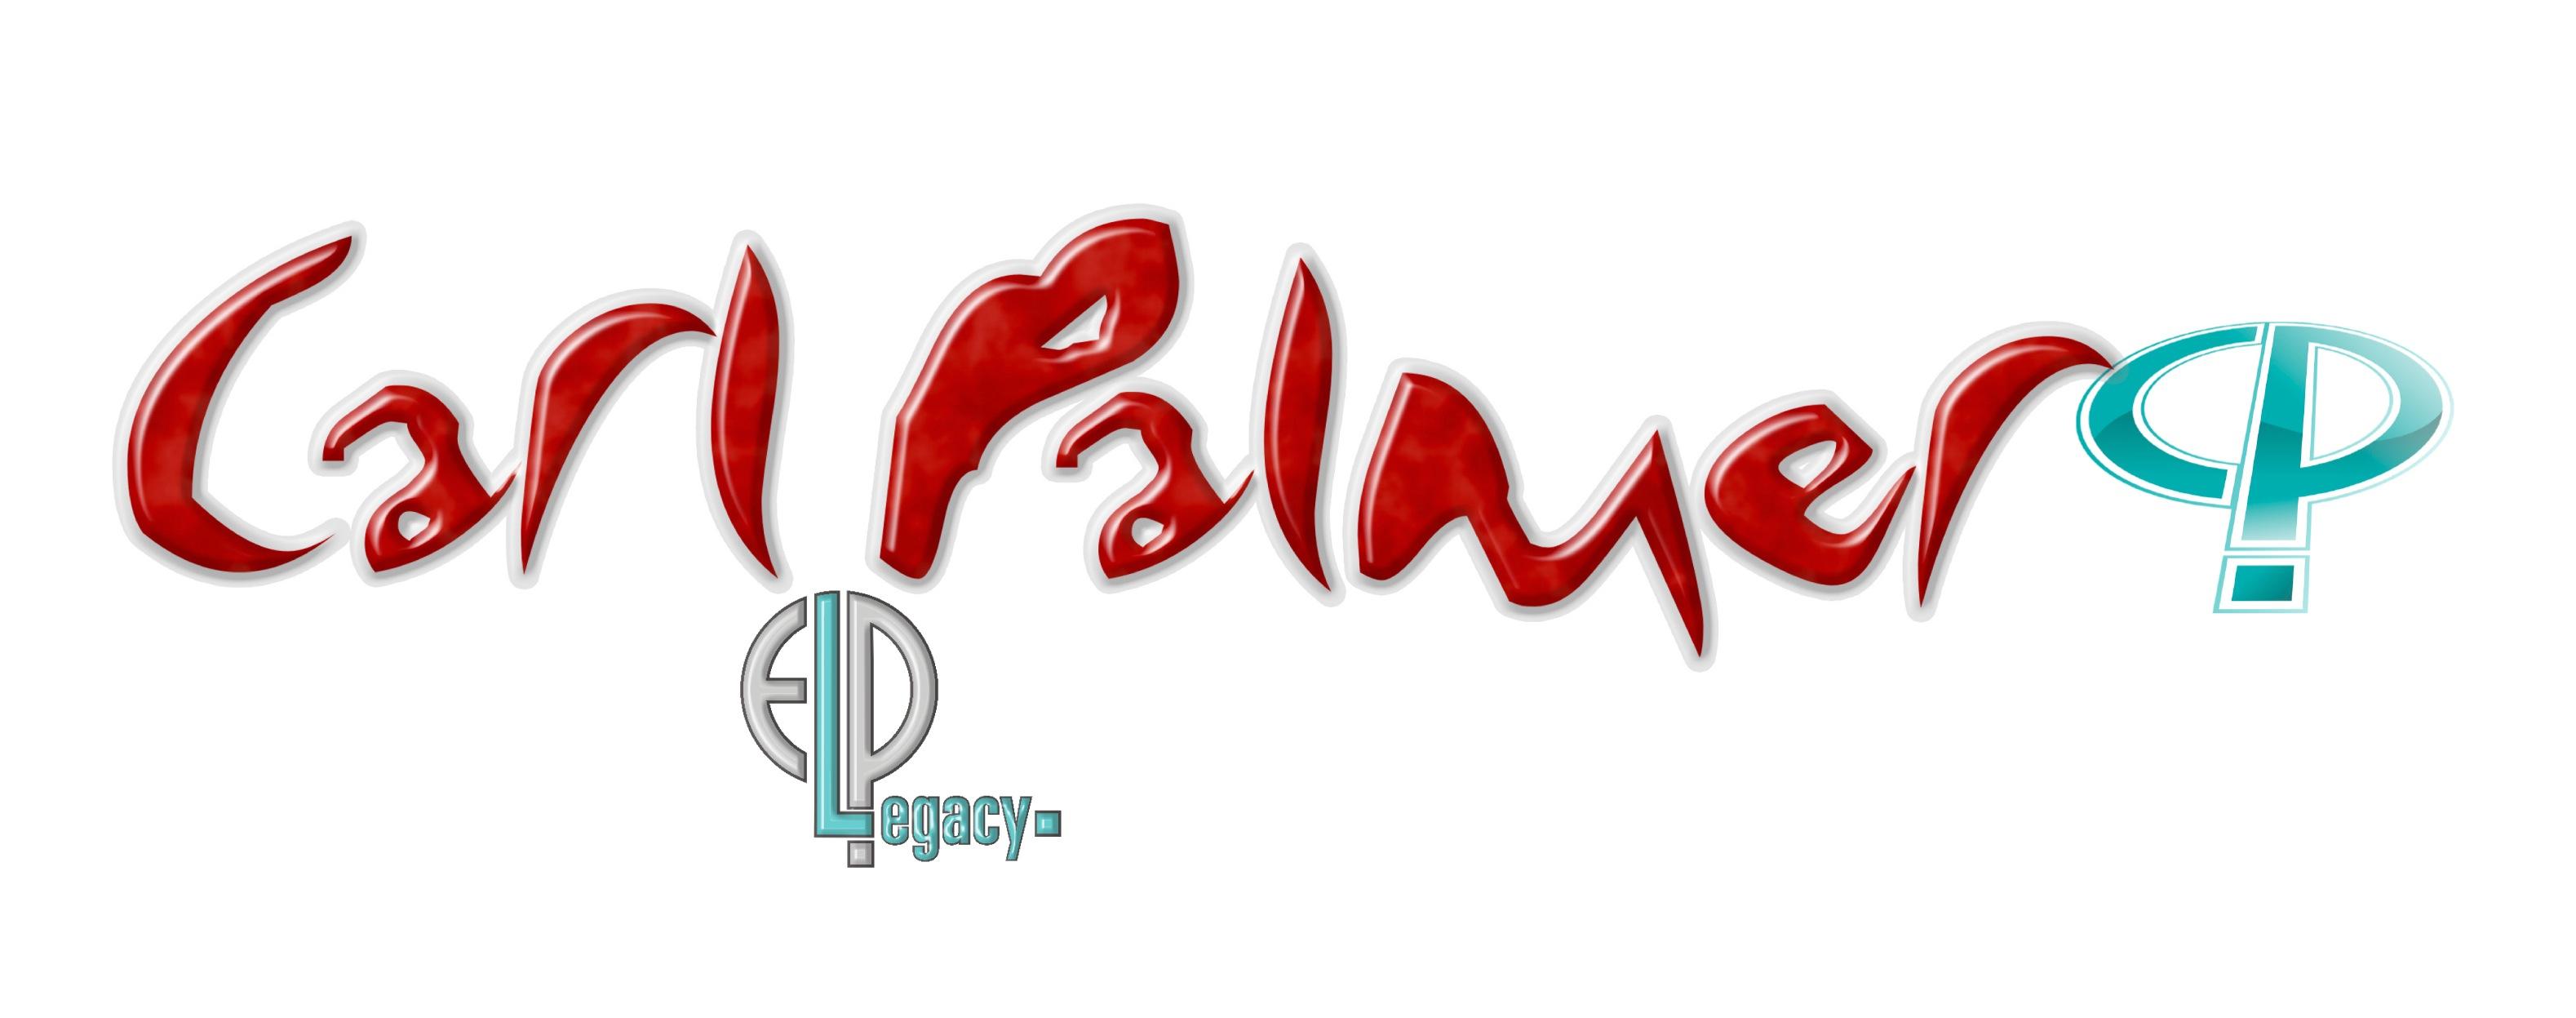 Carl-Palmer-Legacy-Logo-Cropped